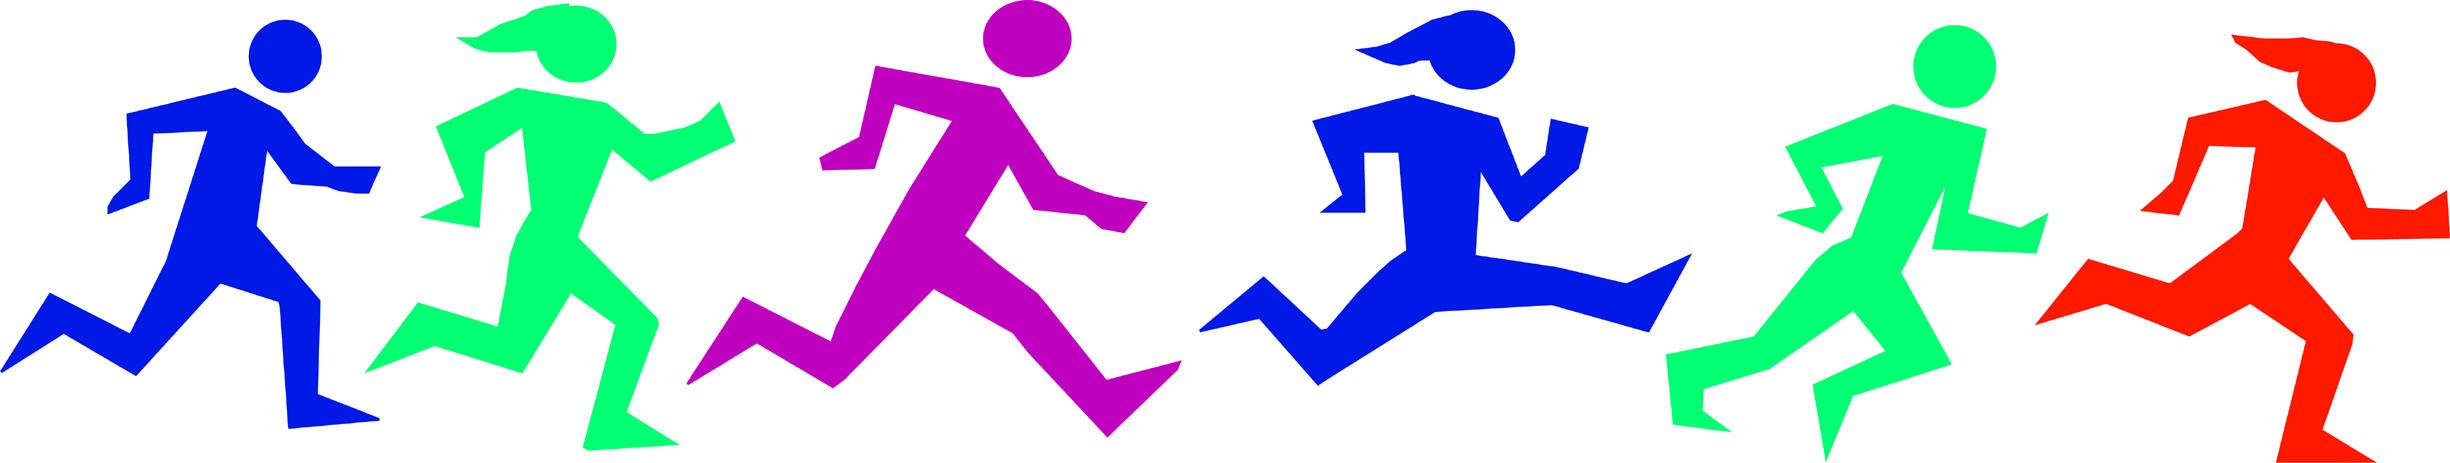 Free running cliparts download. Race clipart kid marathon